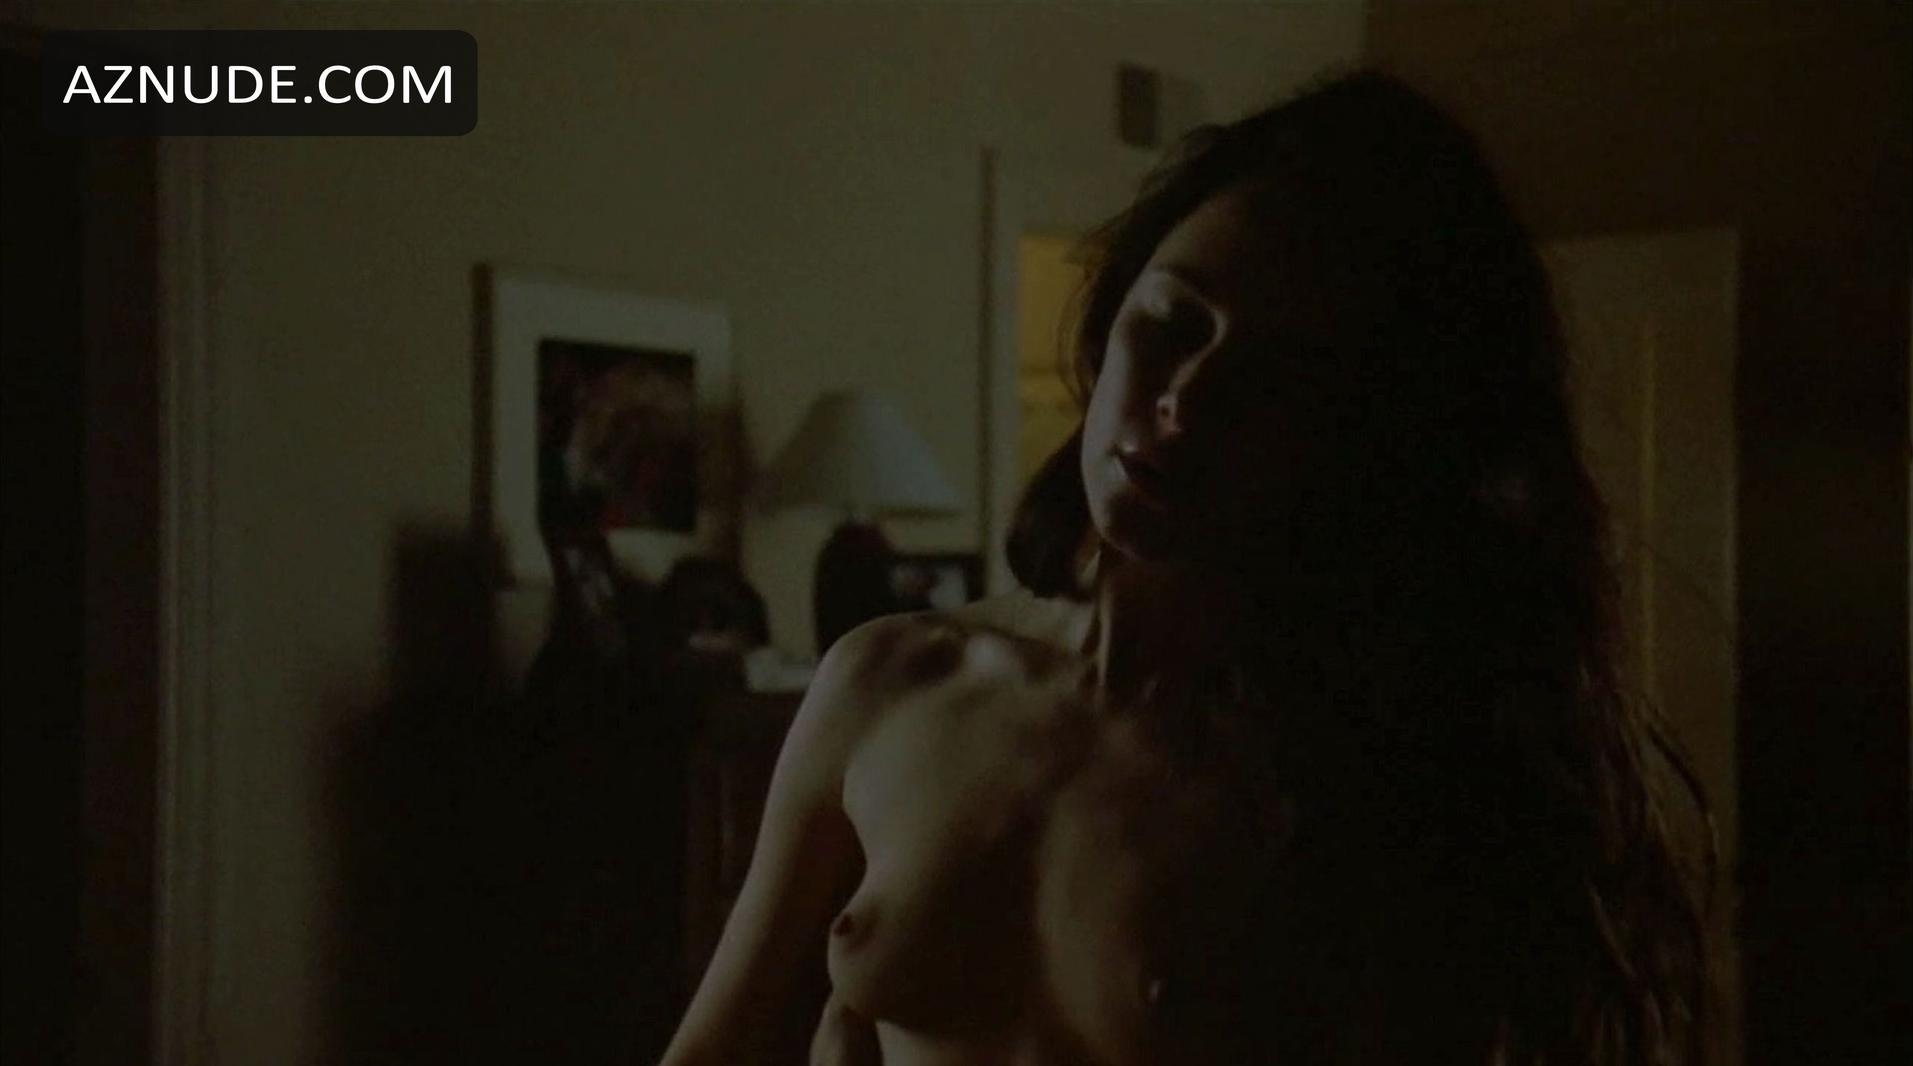 unlawful Madeleine stowe nude